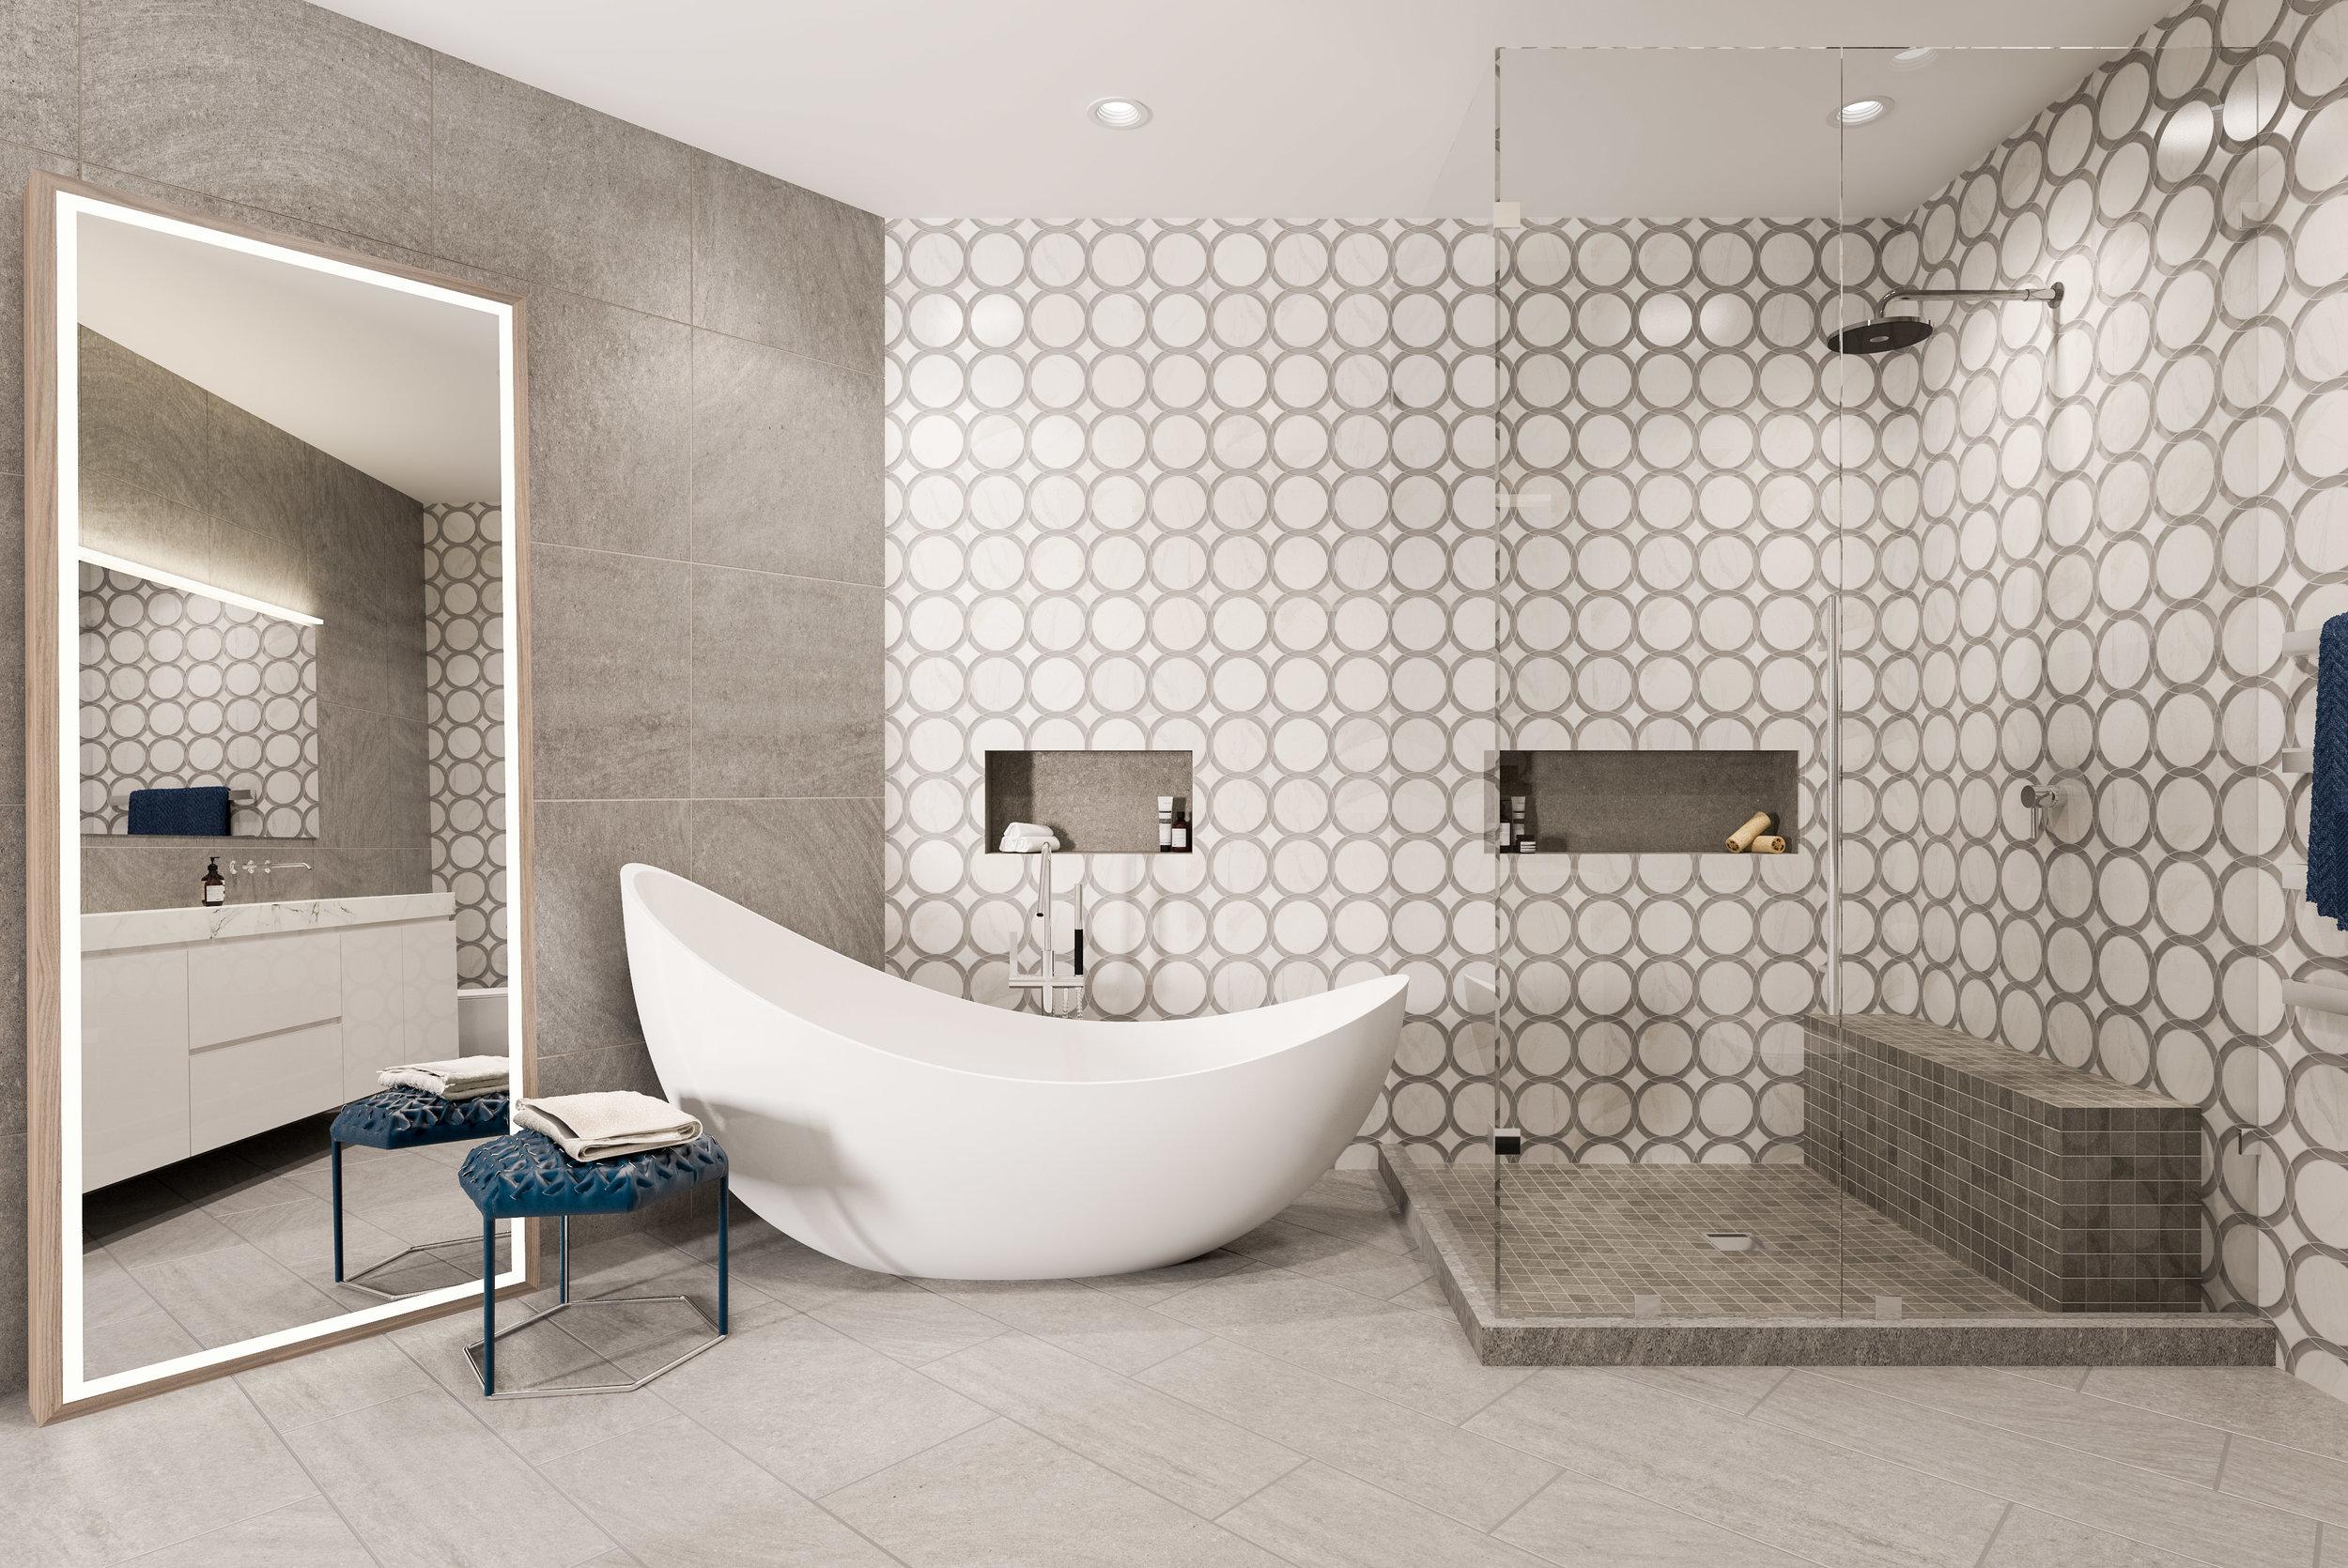 RumPoint_Bathroom3_Final01 (1).jpg